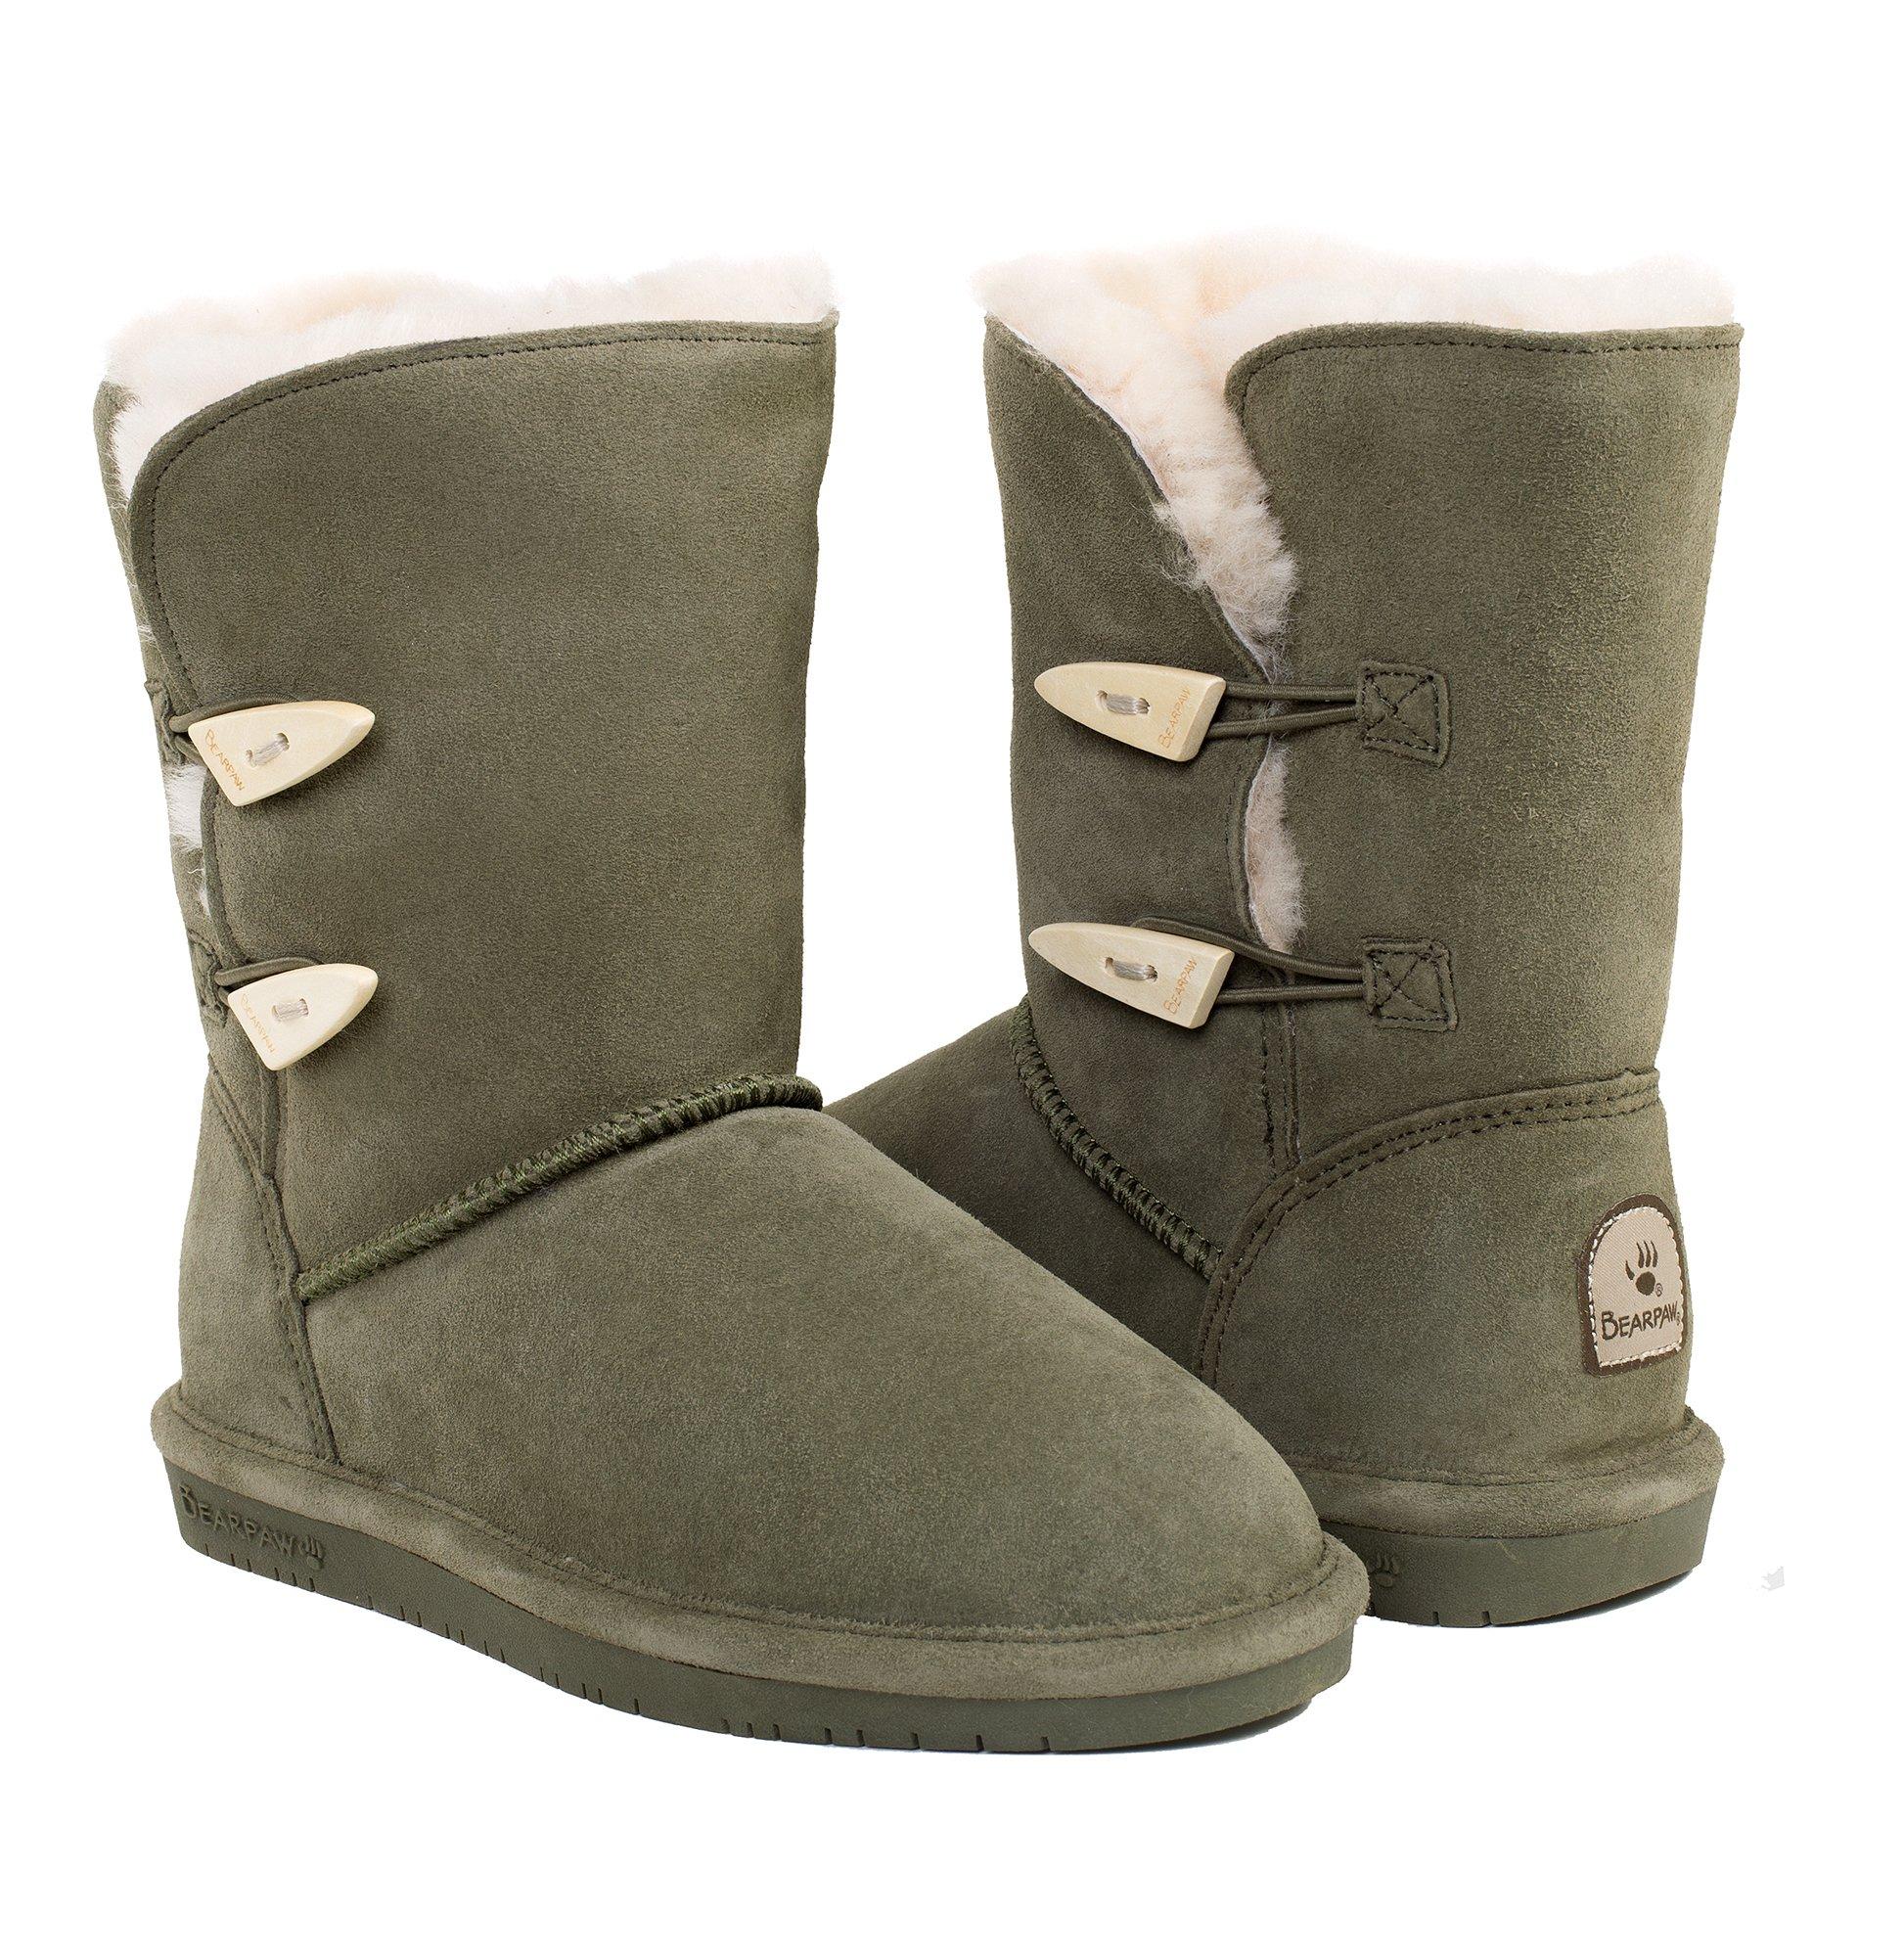 Bearpaw Women's Abigail Boot (9 B(M) US, Olive)